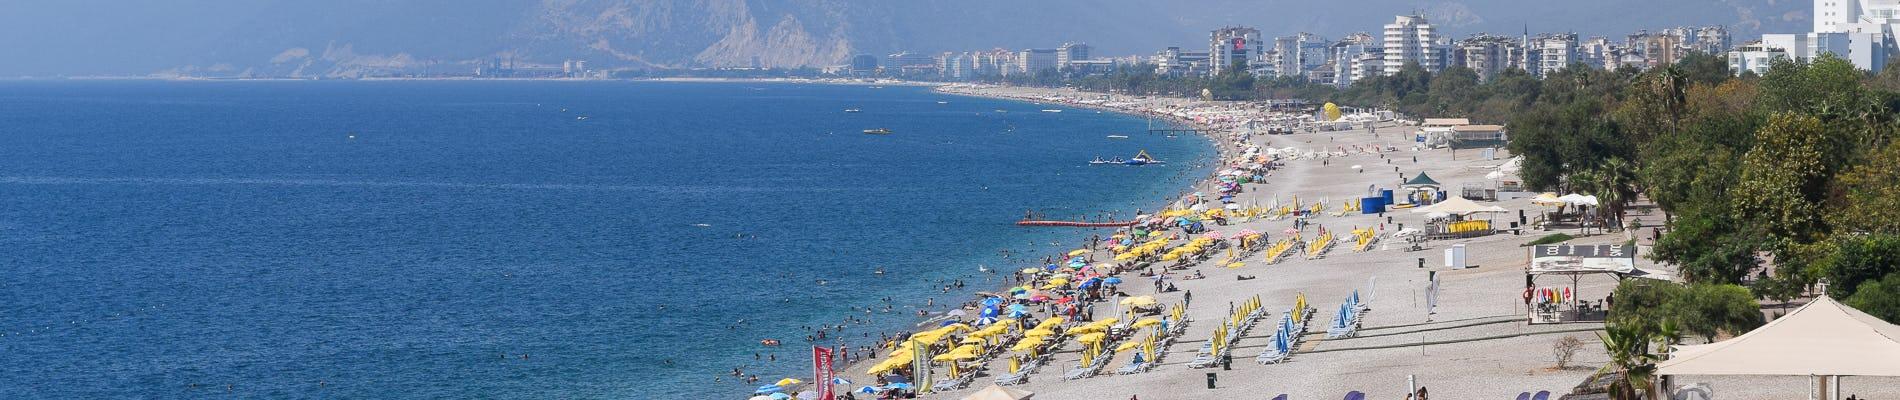 شاطئ داملاتاش Damlatas Beach